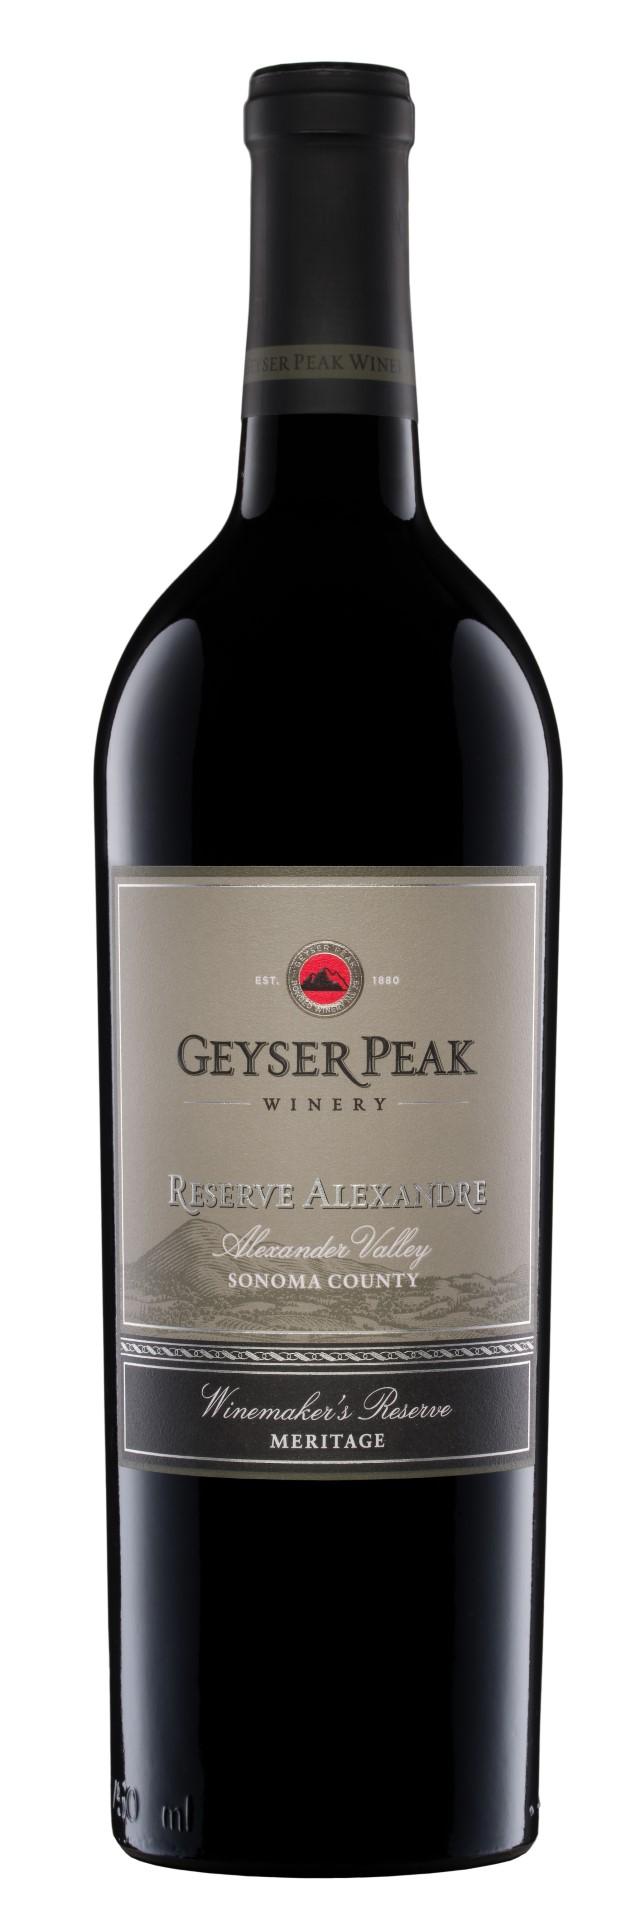 2013 Geyser Peak Meritage Reserve Alexandre